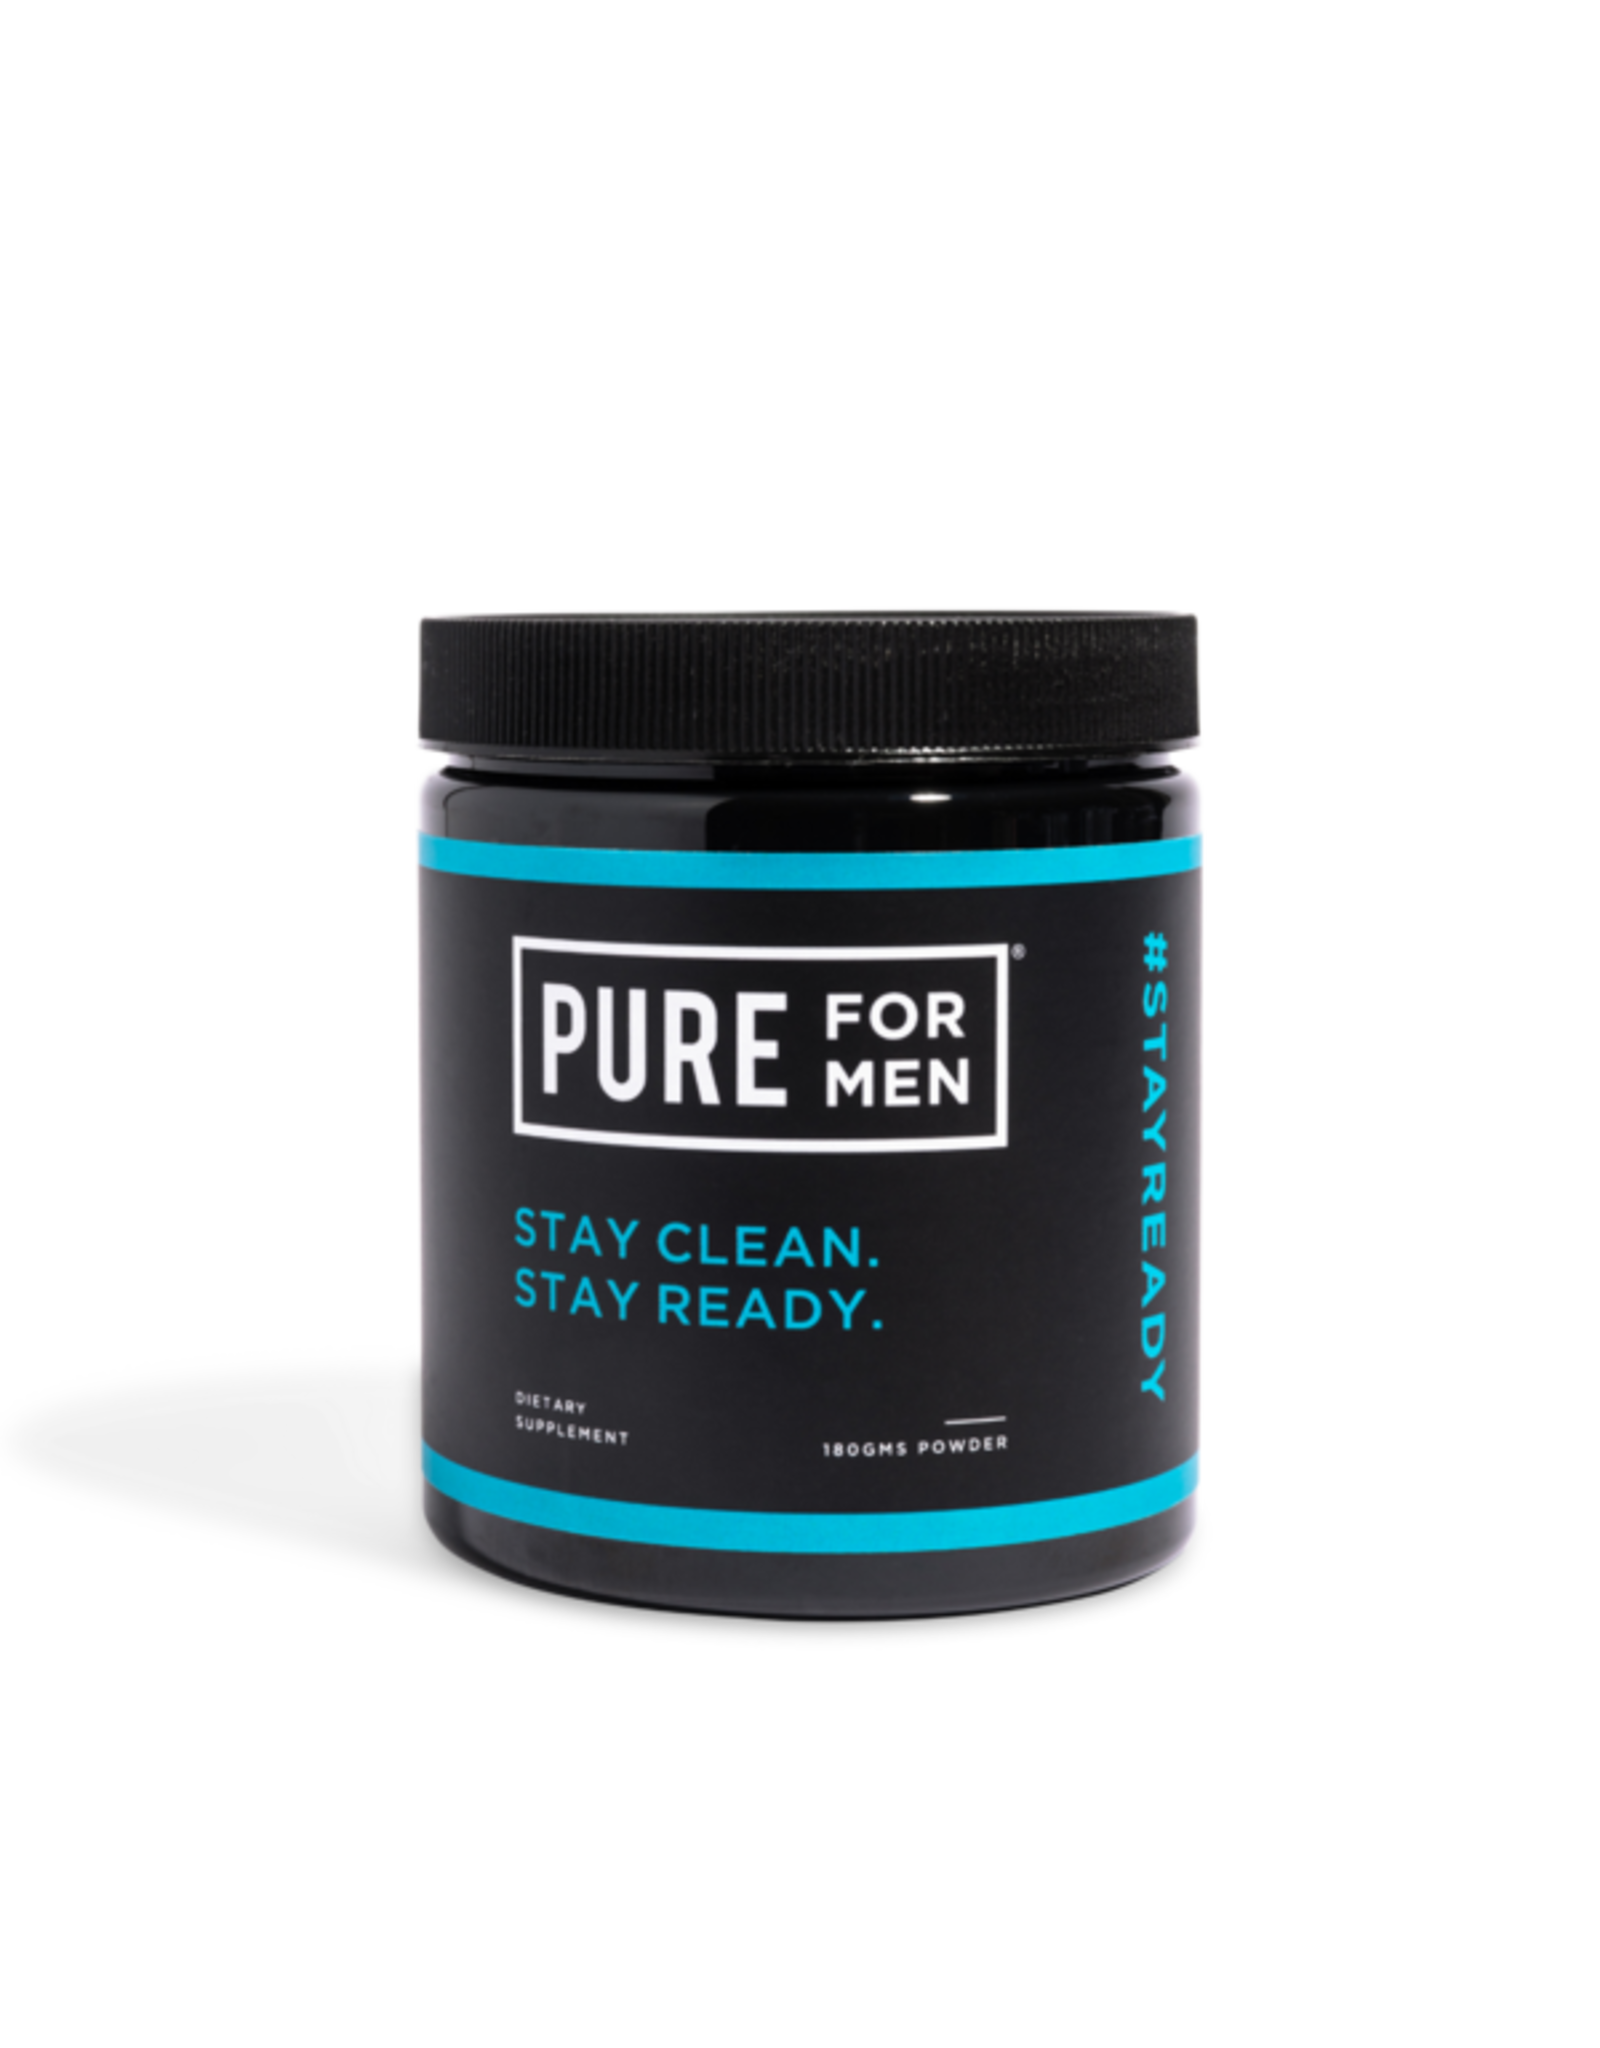 Pure for Men Pure Fiber Capsules and Powder